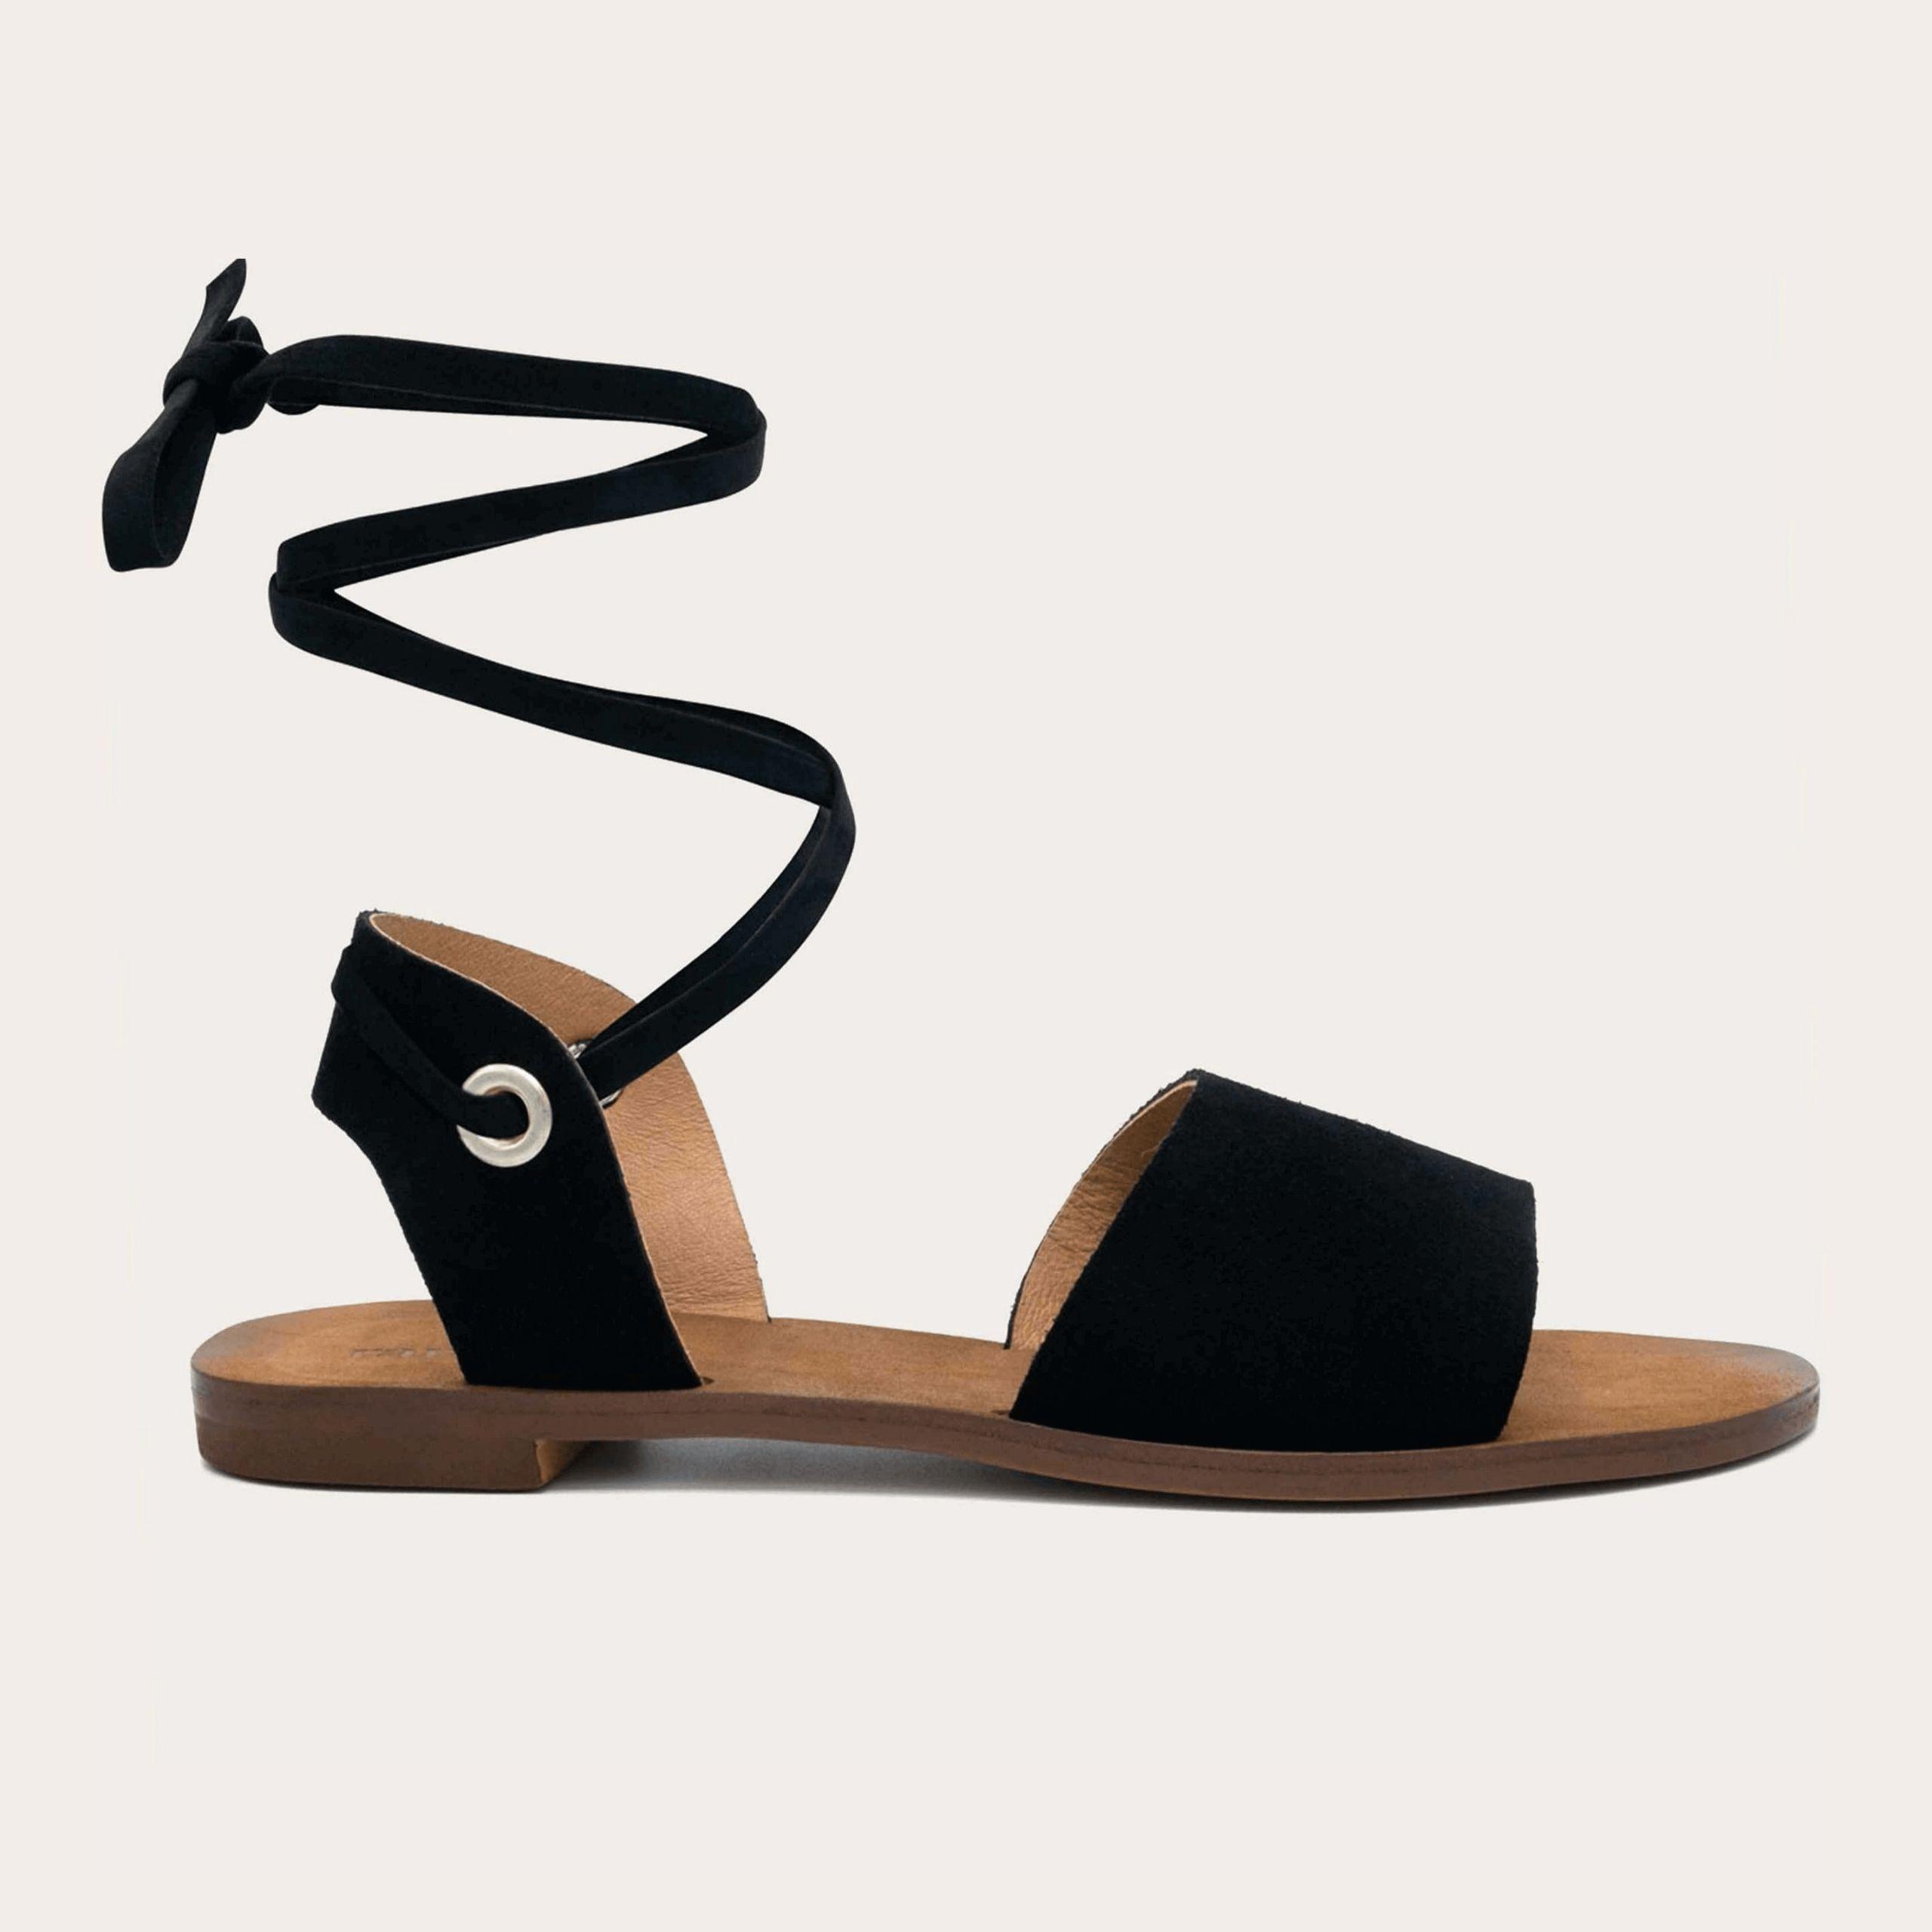 acapulco-black_1_lintsandalen sandals travelsandals vegan sustainable sandals wikkelsandalen